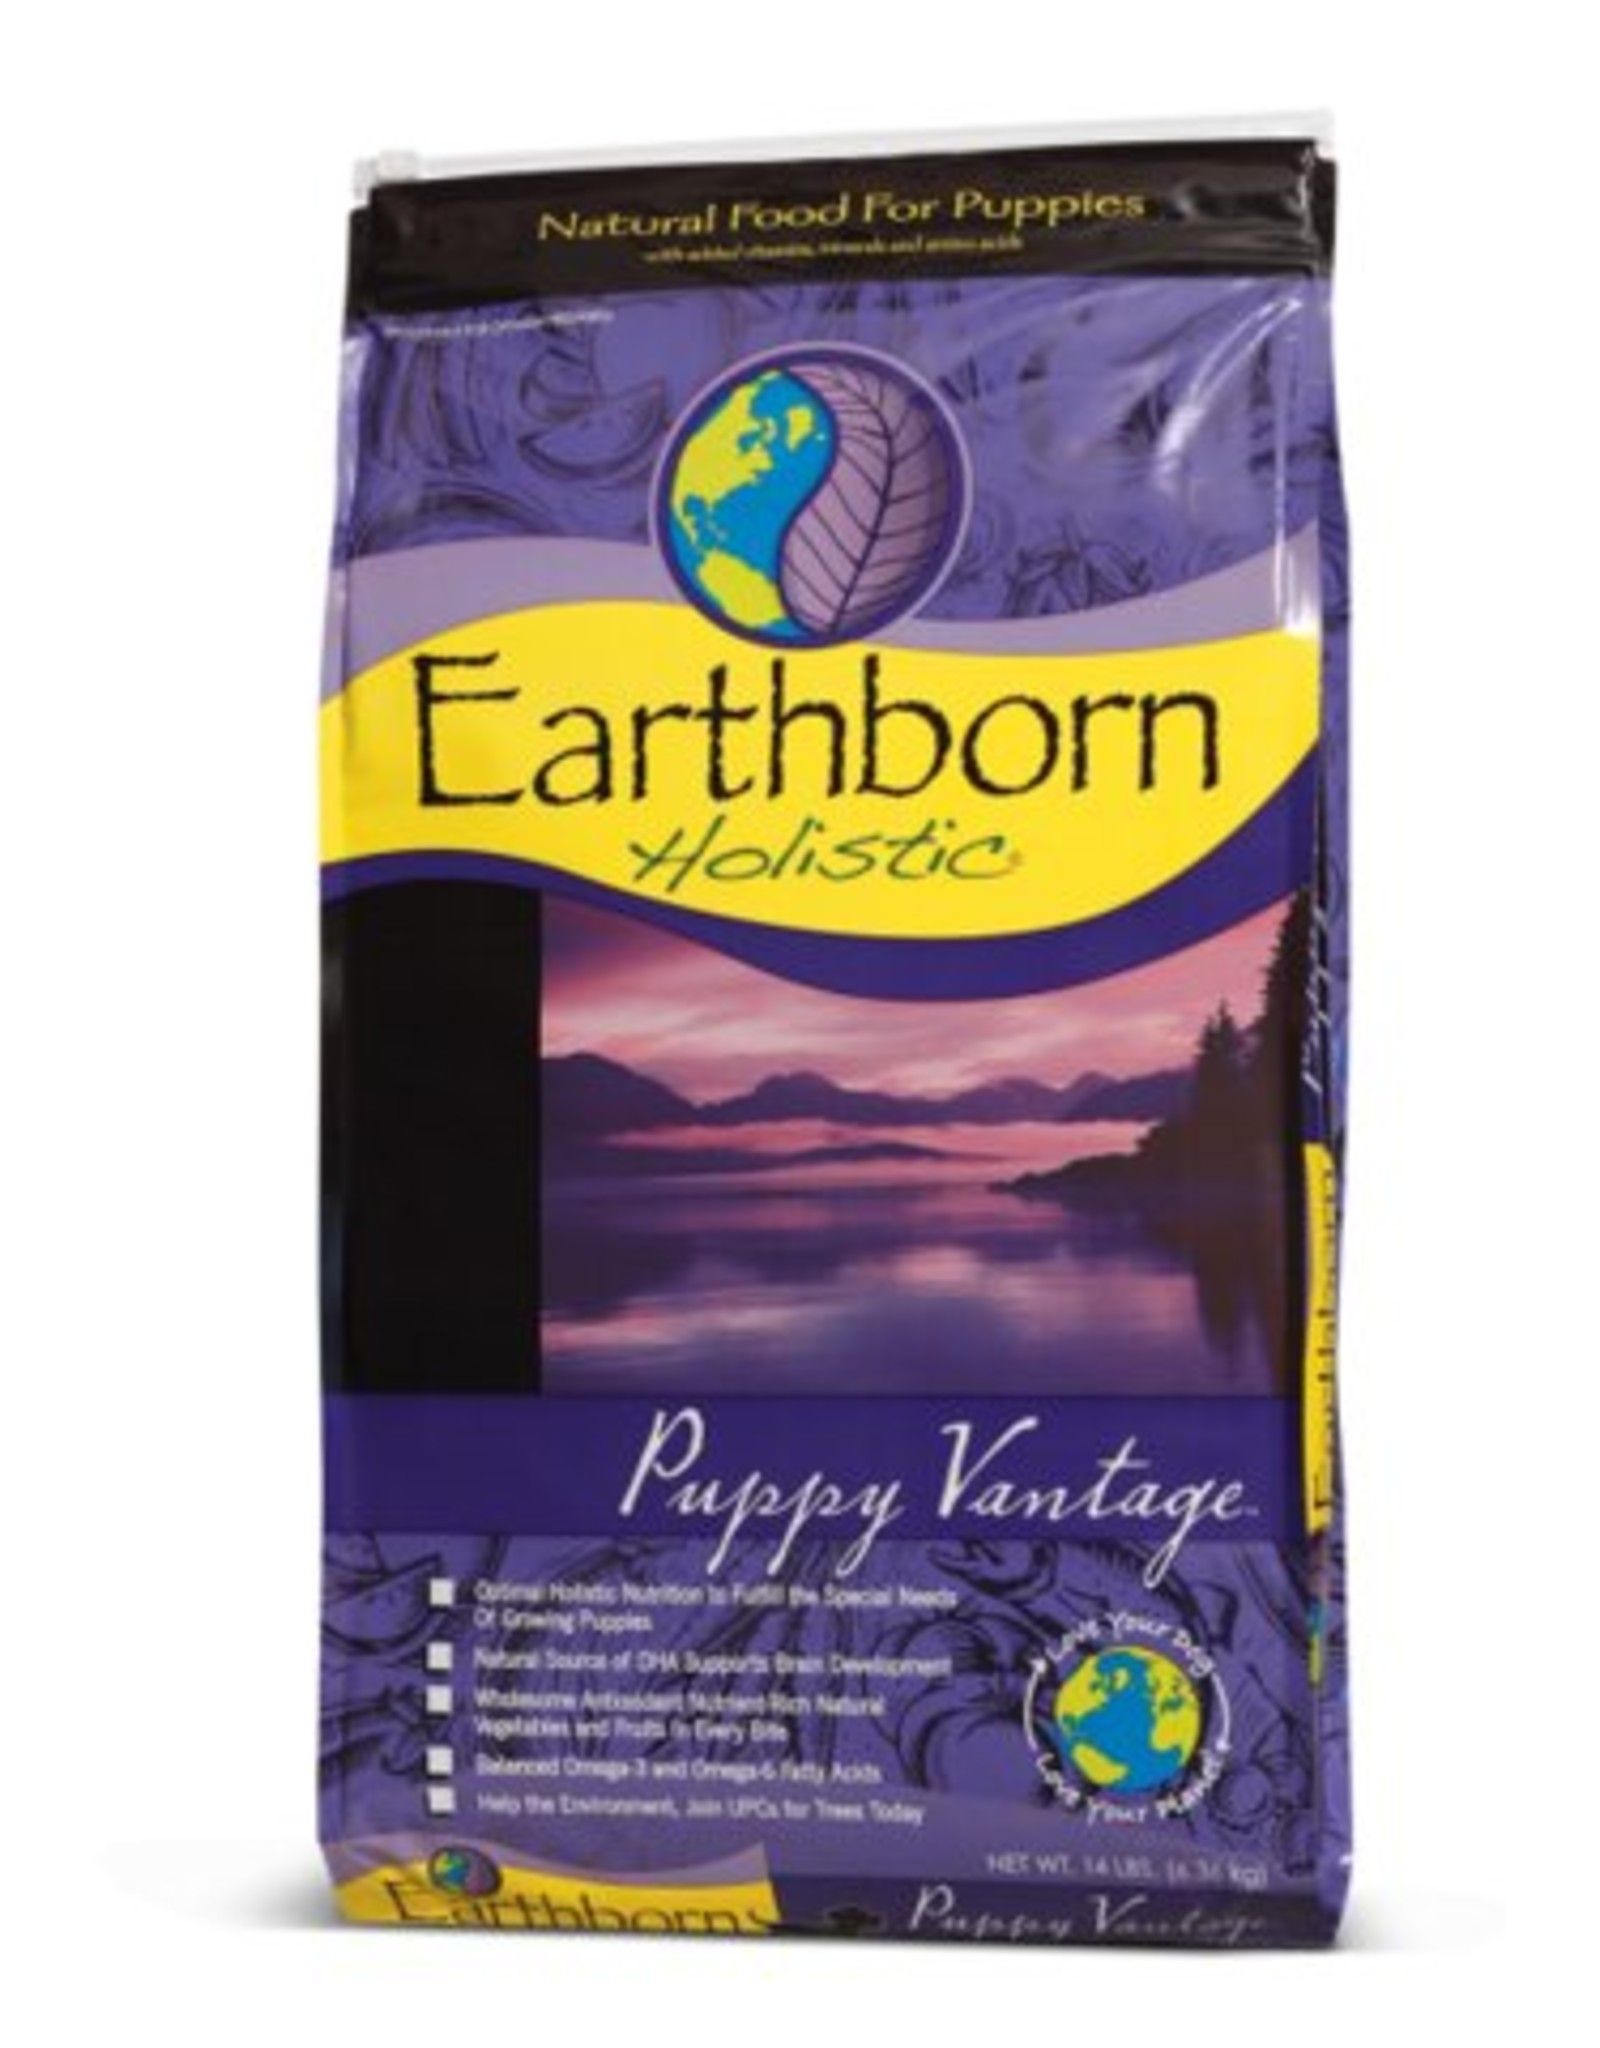 Earthborn Puppy Vantage Grain-Free Dry Dog Food